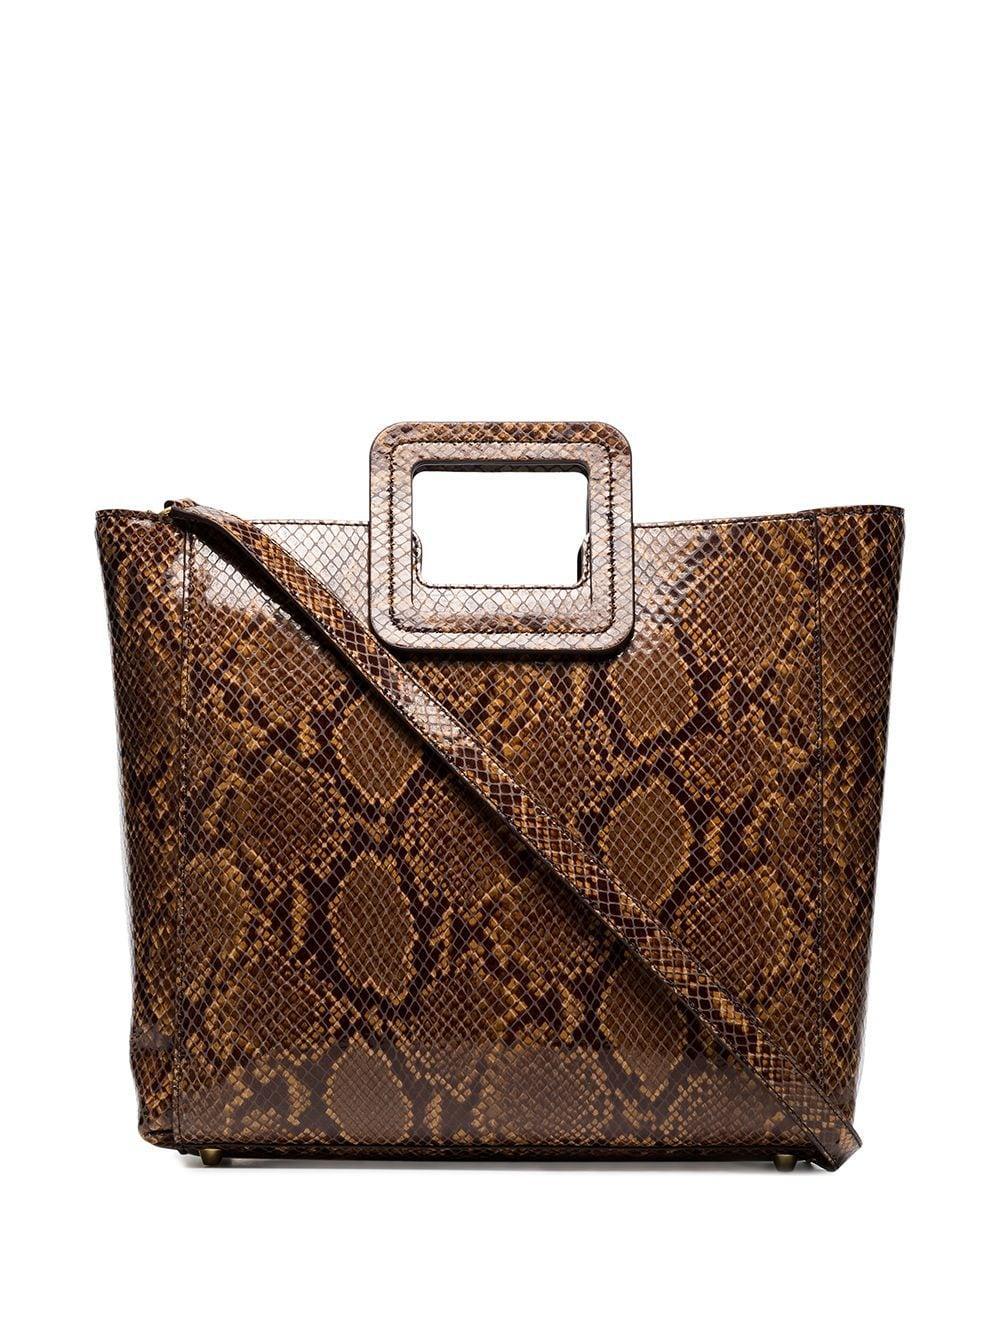 Shirley Bag Caramel Faux Snake Item # 159-9042